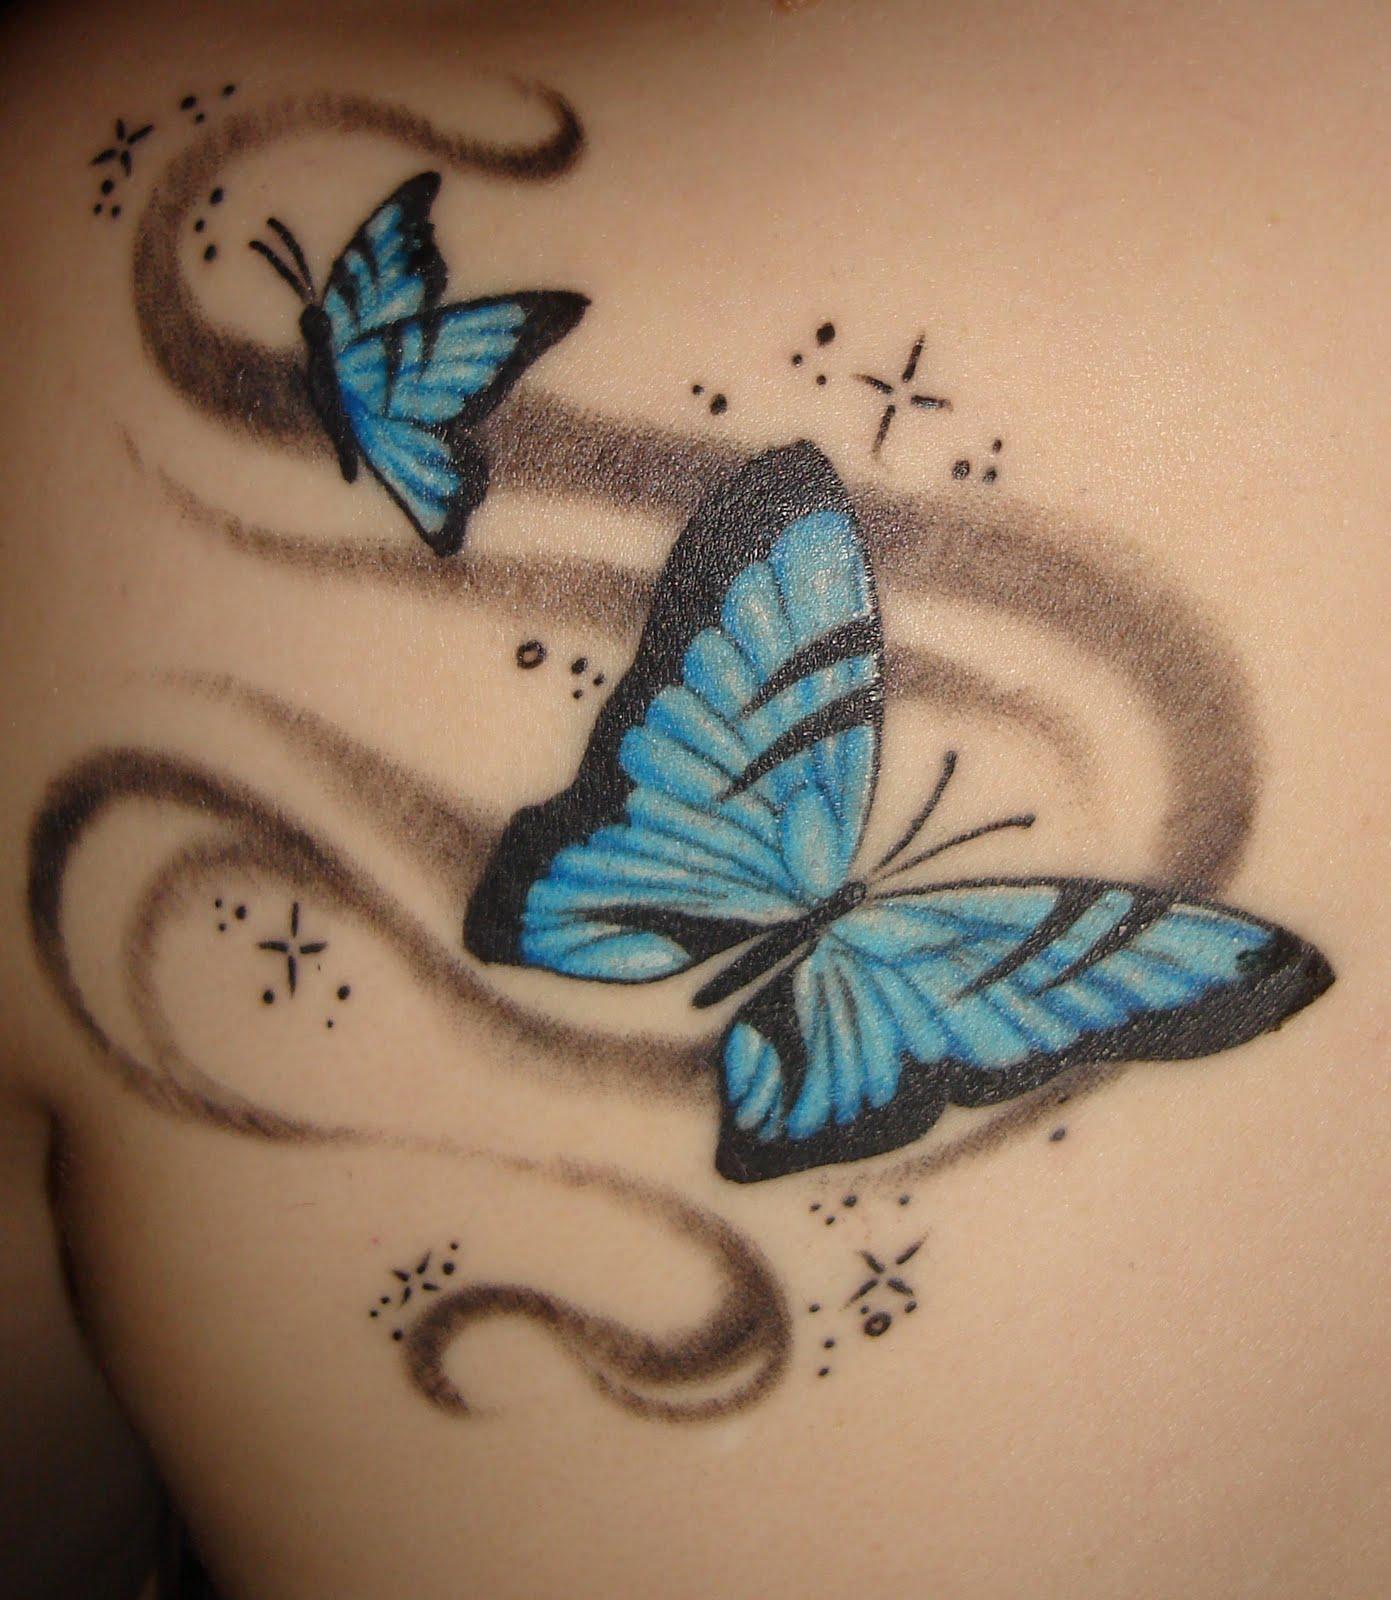 http://3.bp.blogspot.com/-W4NtFLtaXXk/TaiiLENShqI/AAAAAAAAADQ/oLxmjrte4lU/s1600/blue_butterfly_tattoo_by_KarateKid89.jpg